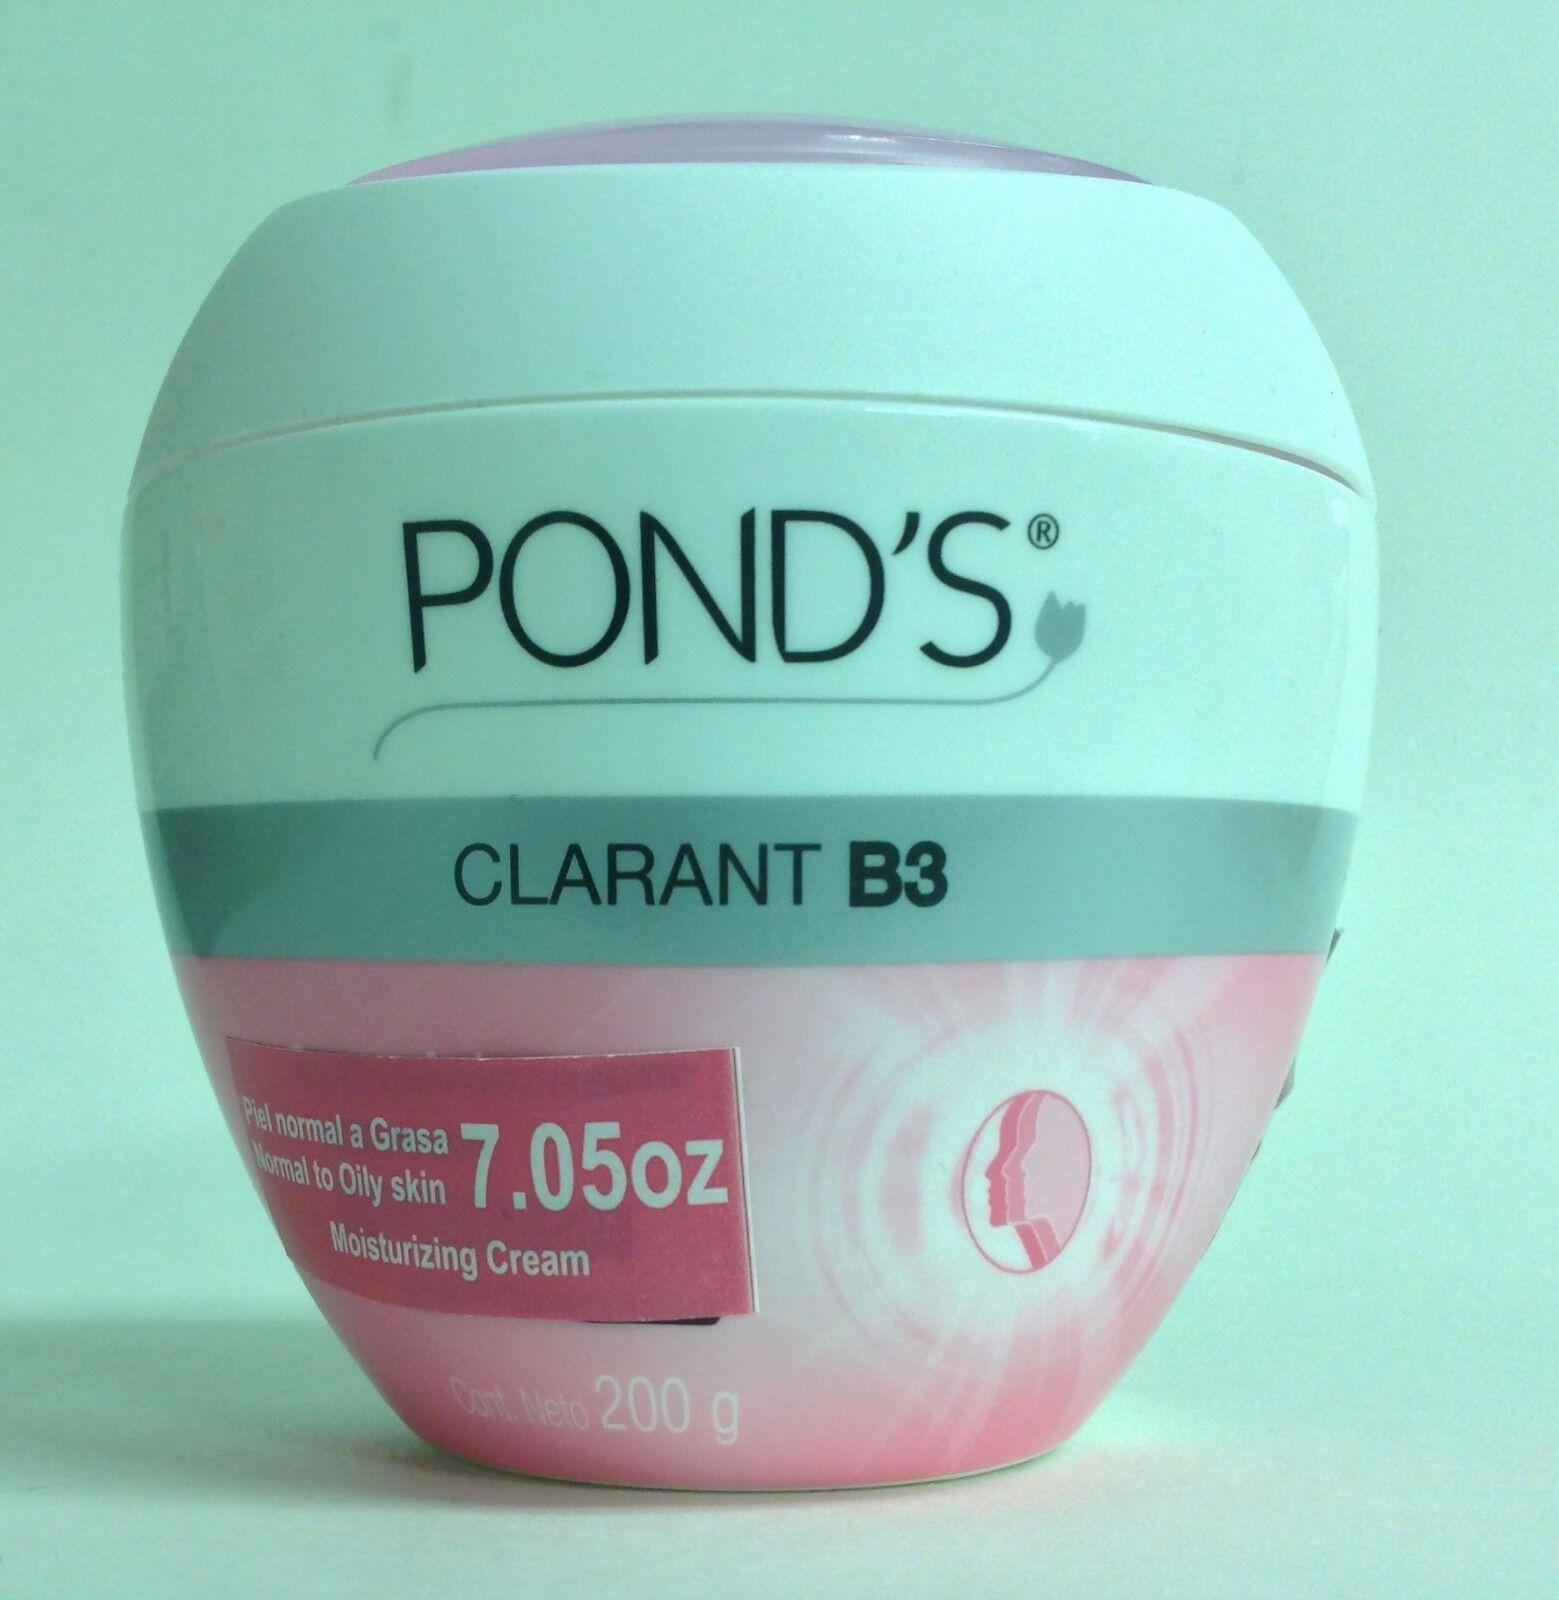 3 POND'S PONDS CLARANT B3 CREAMS NORMAL TO OILY SKIN 7.05oz/PIEL NORMAL A GRASA 1